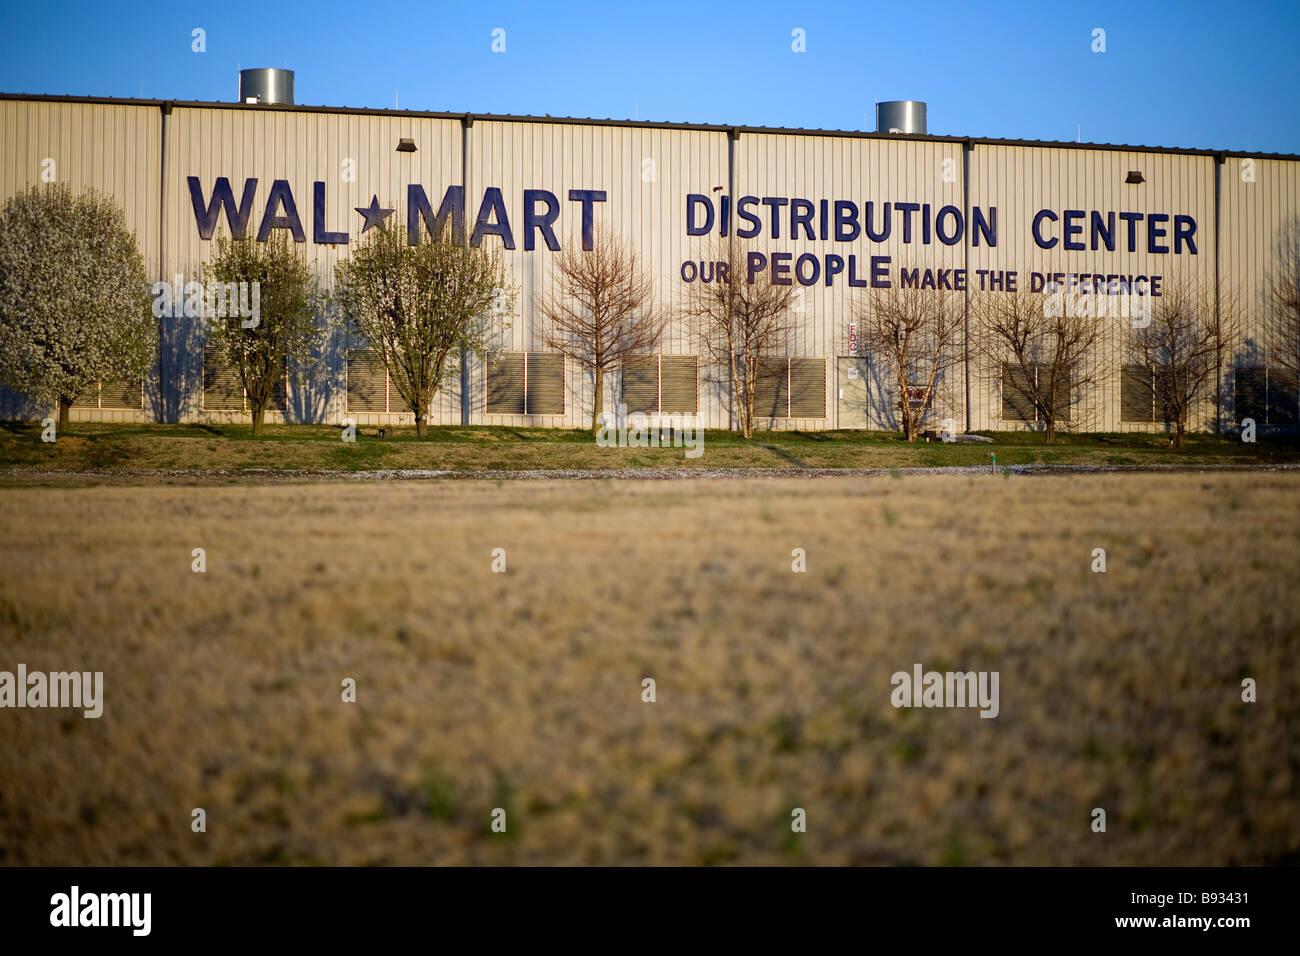 Walmart Distribution Center No. 6094 in Bentonville ...